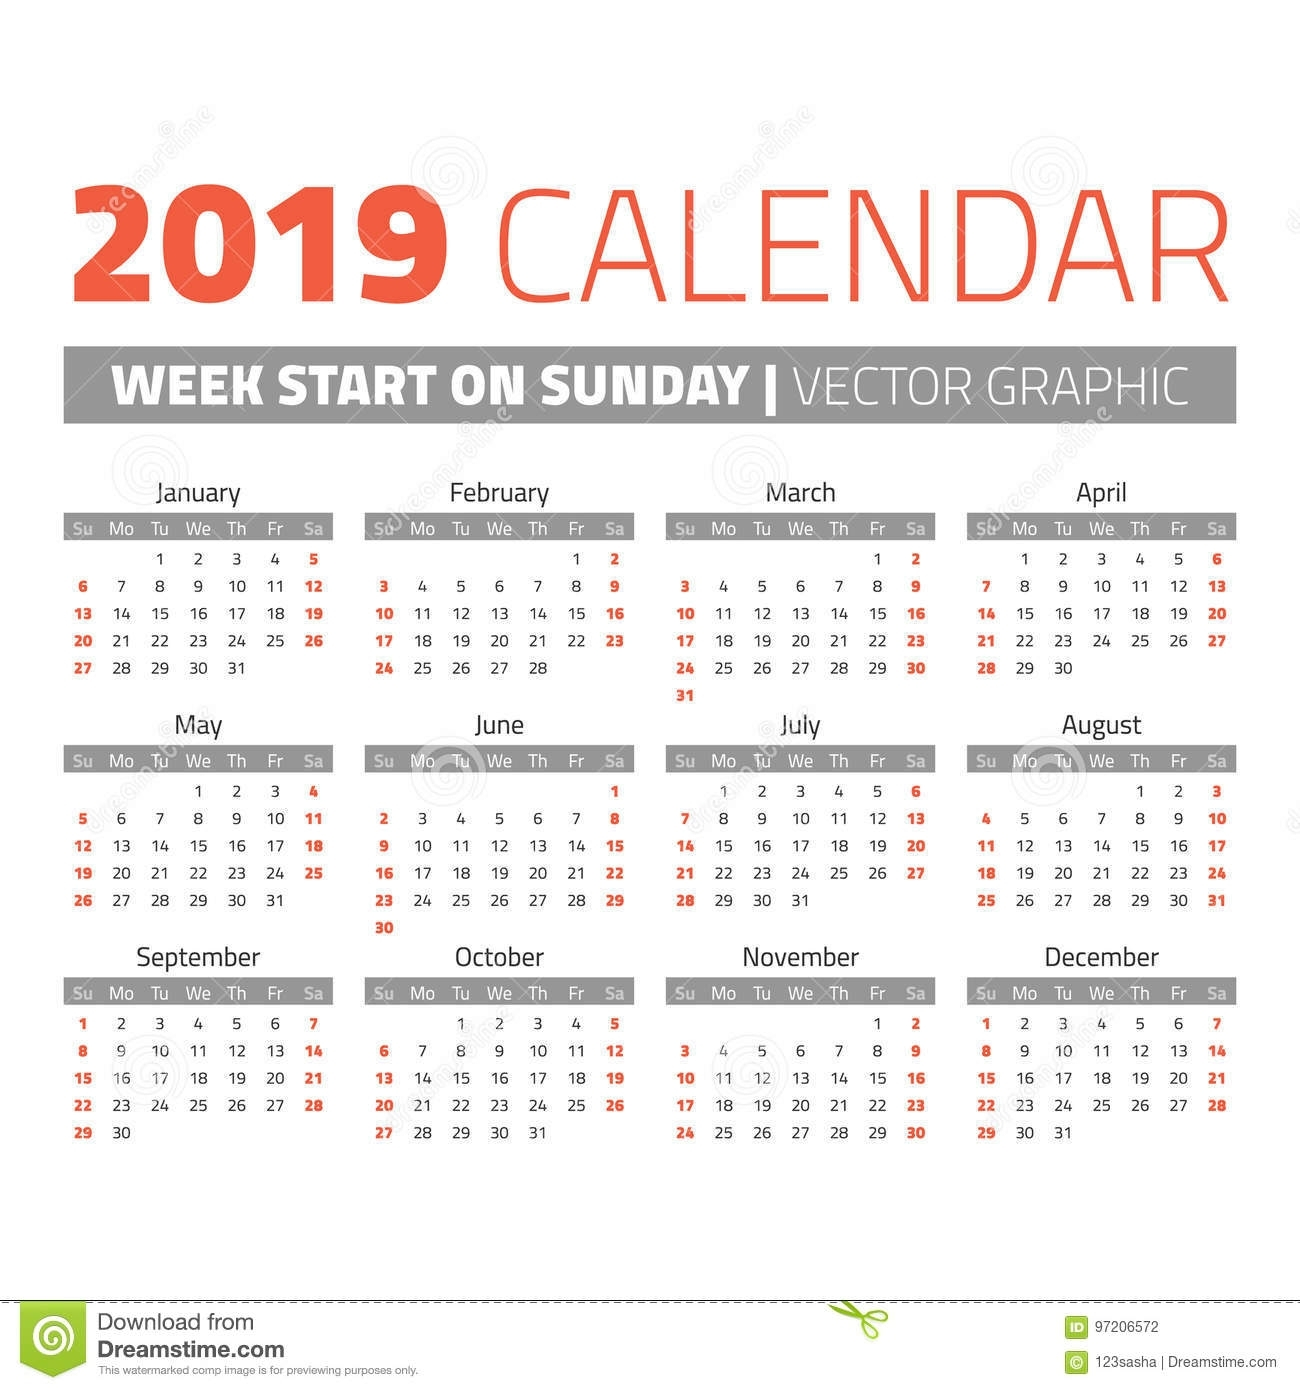 Simple 2019 Year Calendar Stock Vector. Illustration Of Date - 97206572